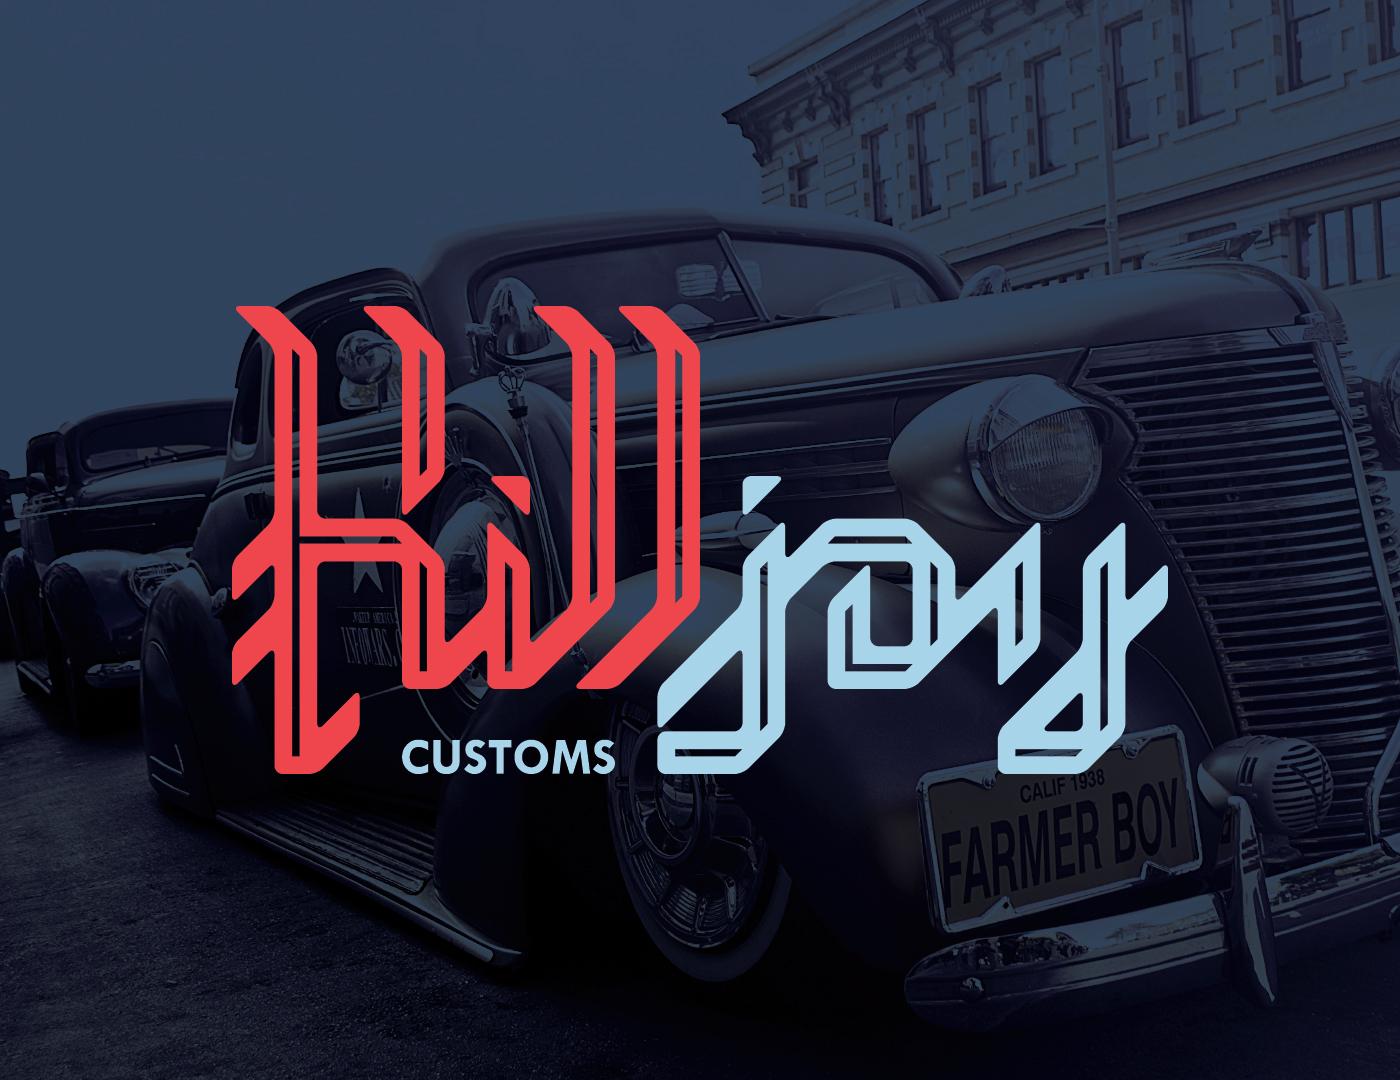 Blackletter Custom CustomCar Killjoy Calligraphy   logo orange blue lowrider classiccar